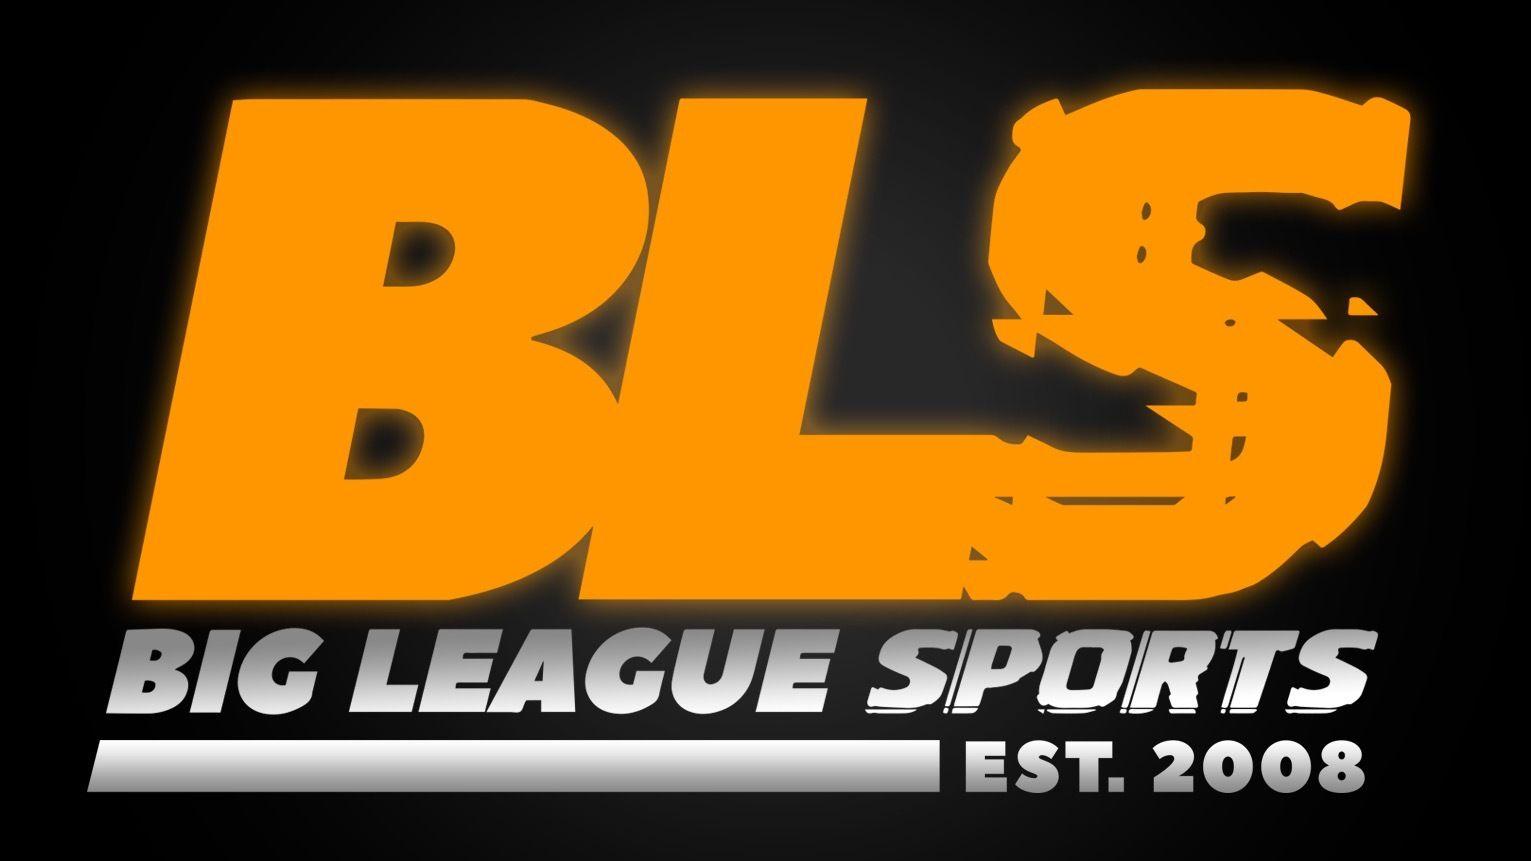 Big League Sports - Fairfield County